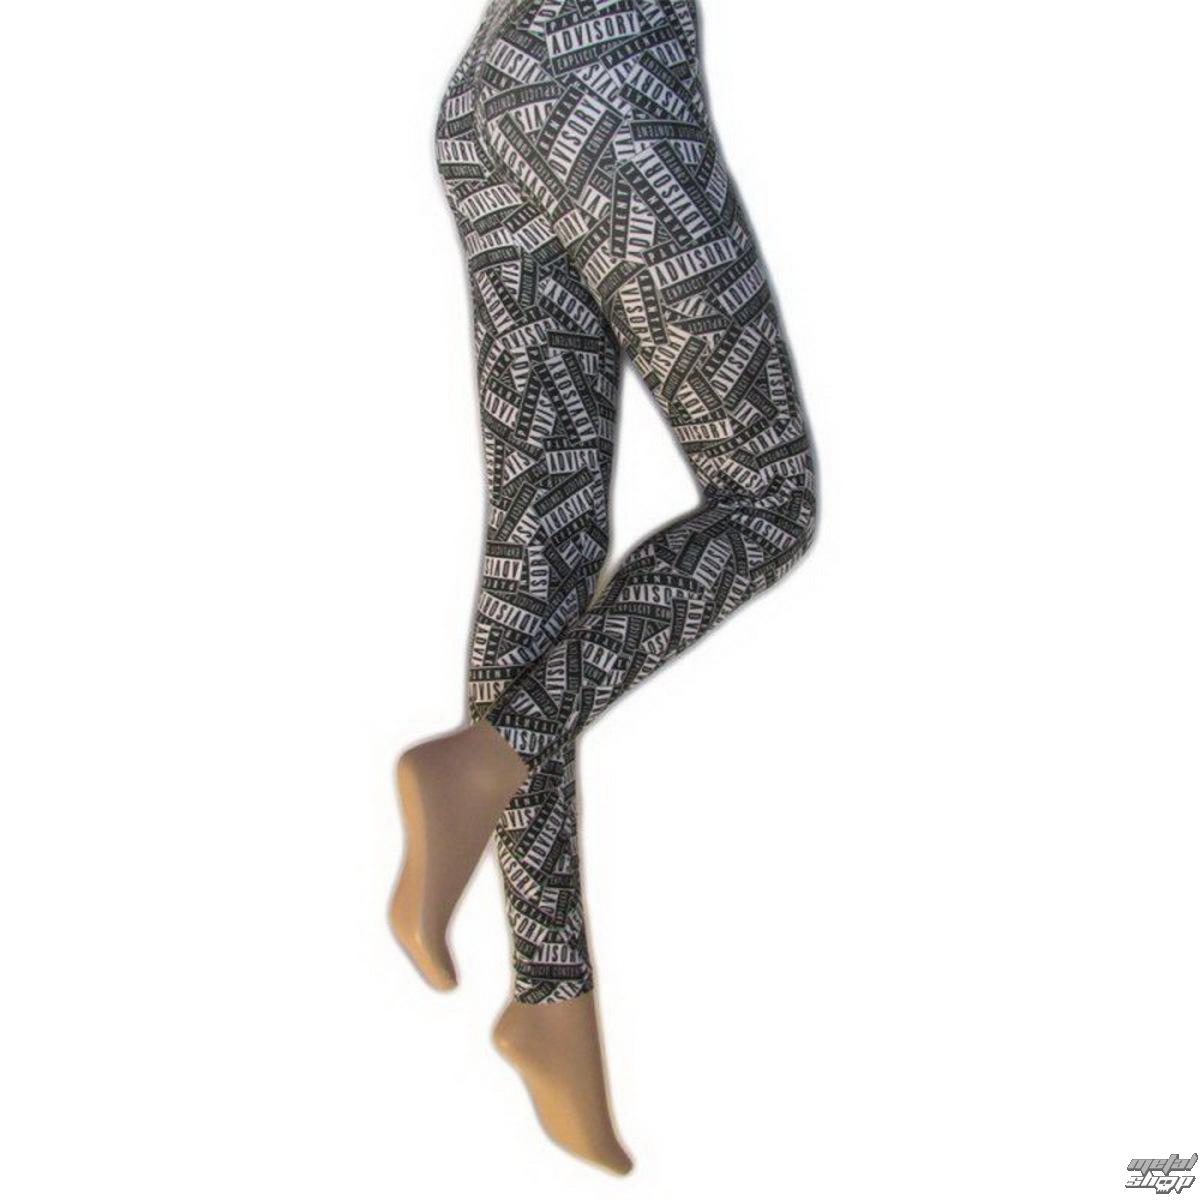 nohavice dámske (legíny) LEGWEAR - Parental Advisory - SHLEPA2AS1